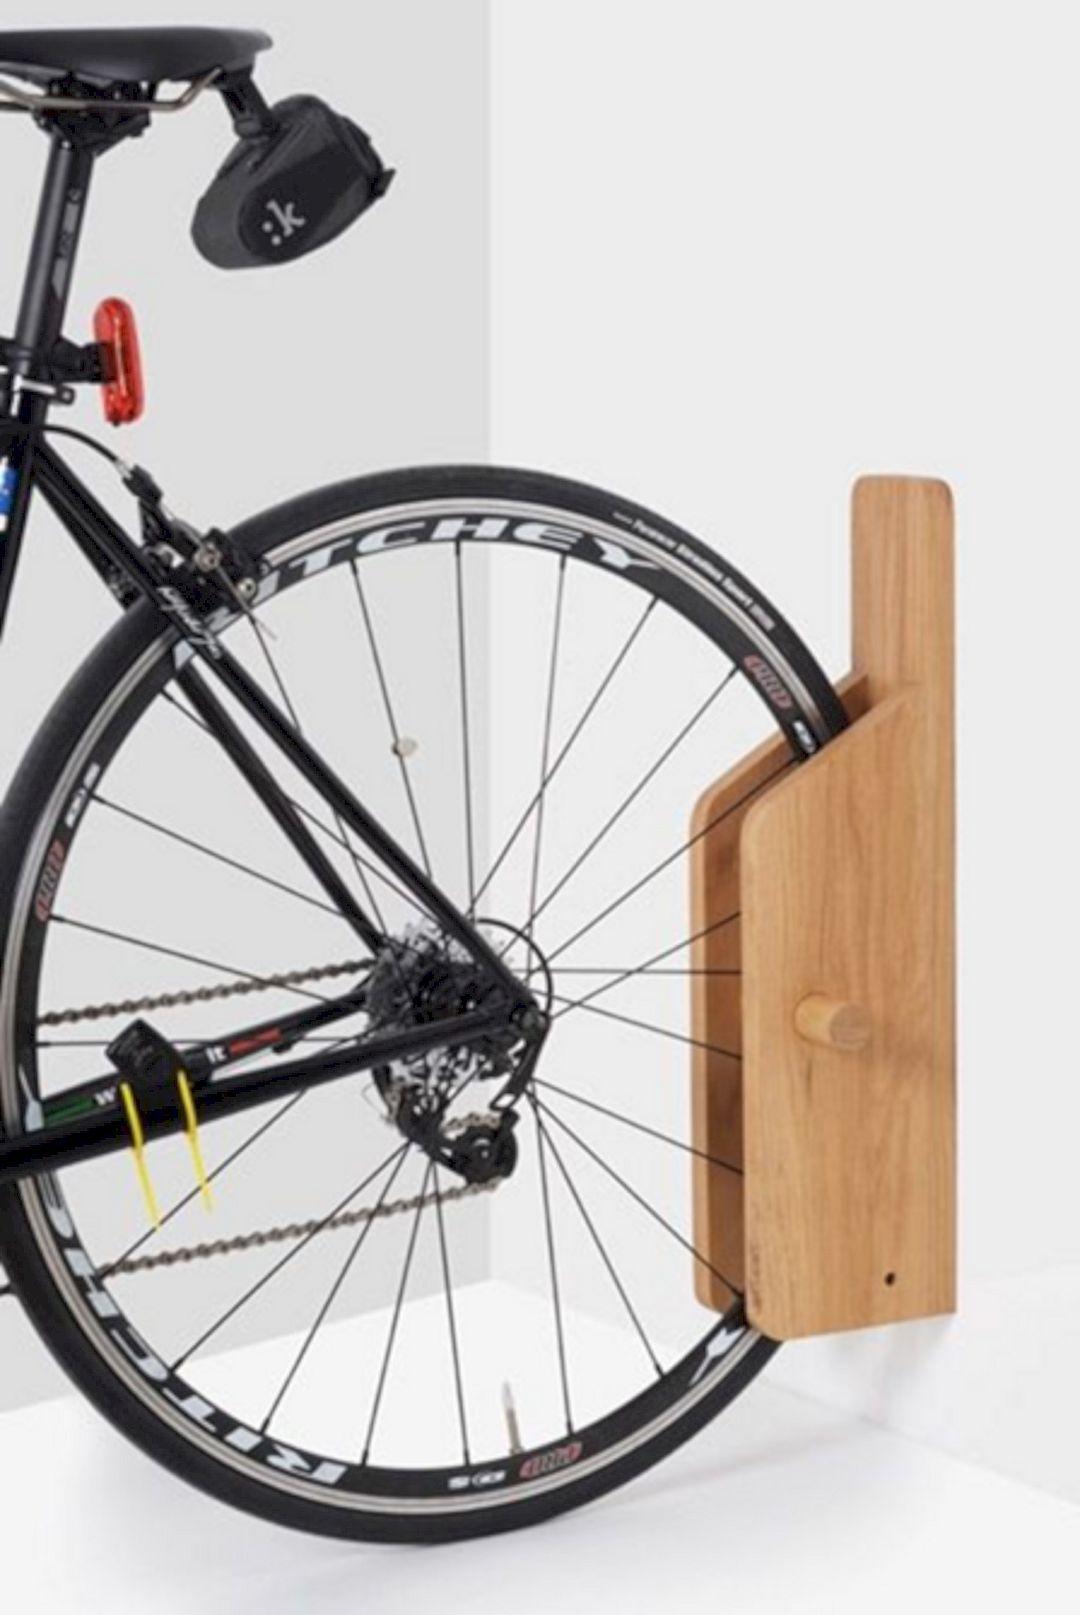 Revonte One A Fully Customizable E Bike Experience With Images Wood Bike Bike Stand Bike Hanger